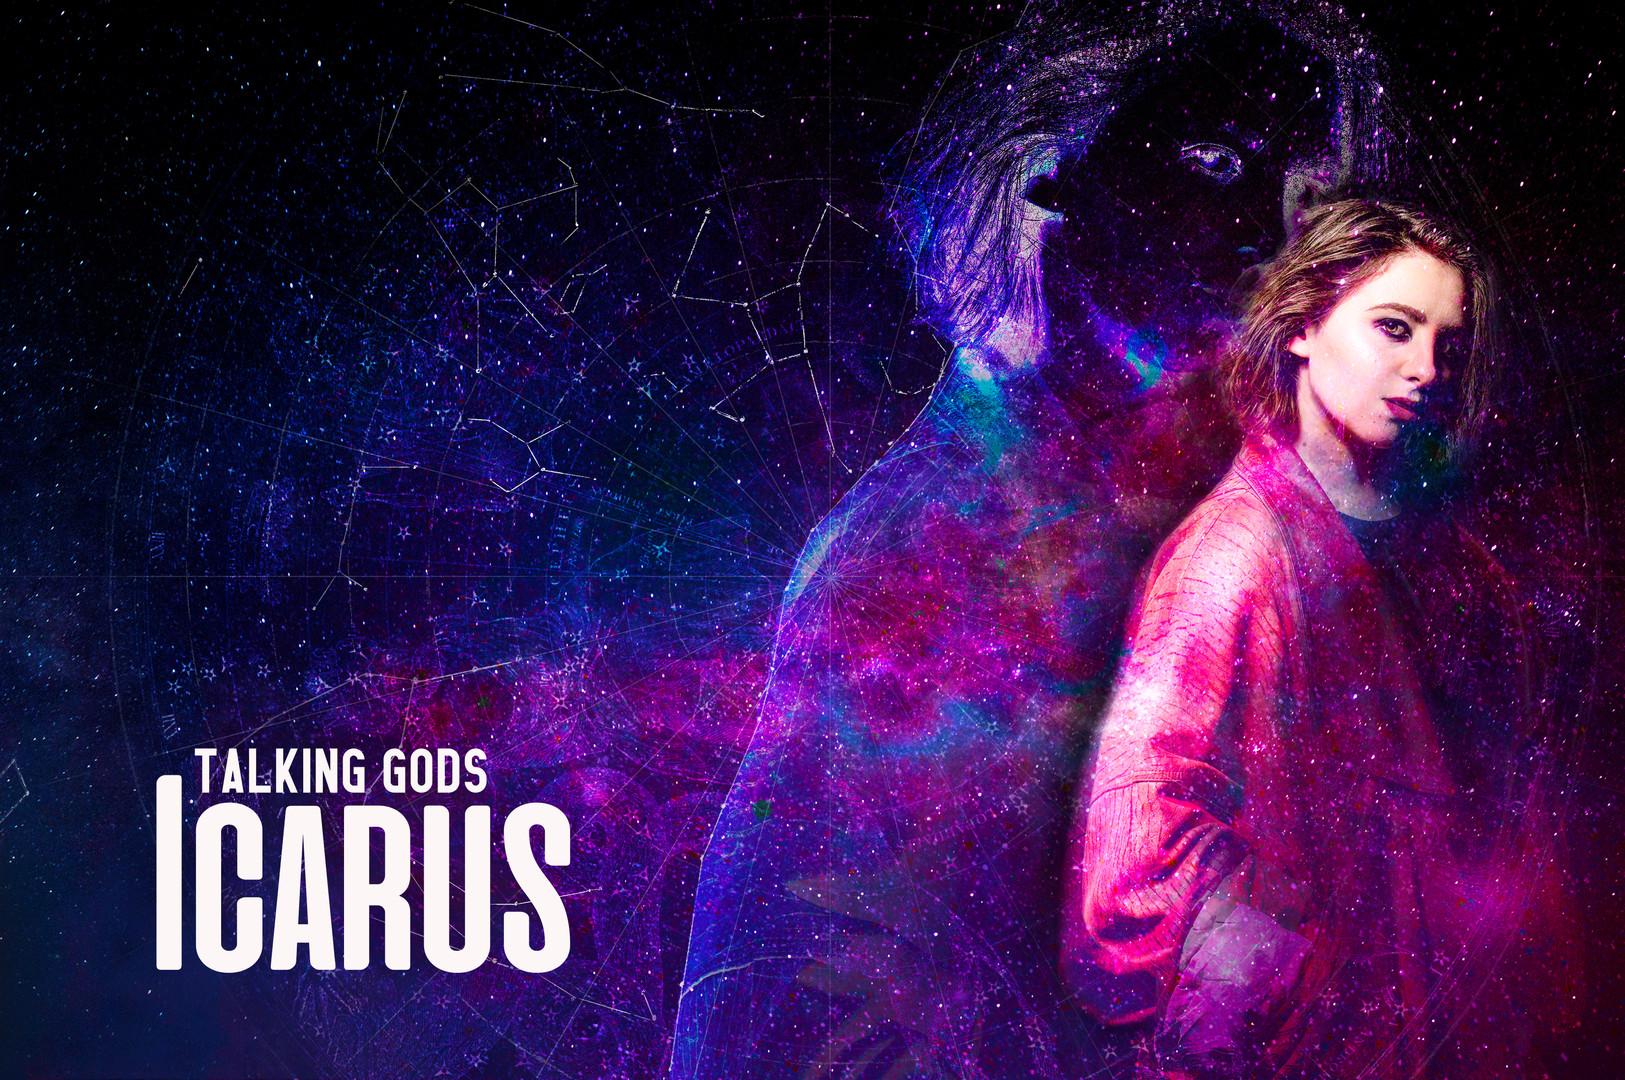 Icarus